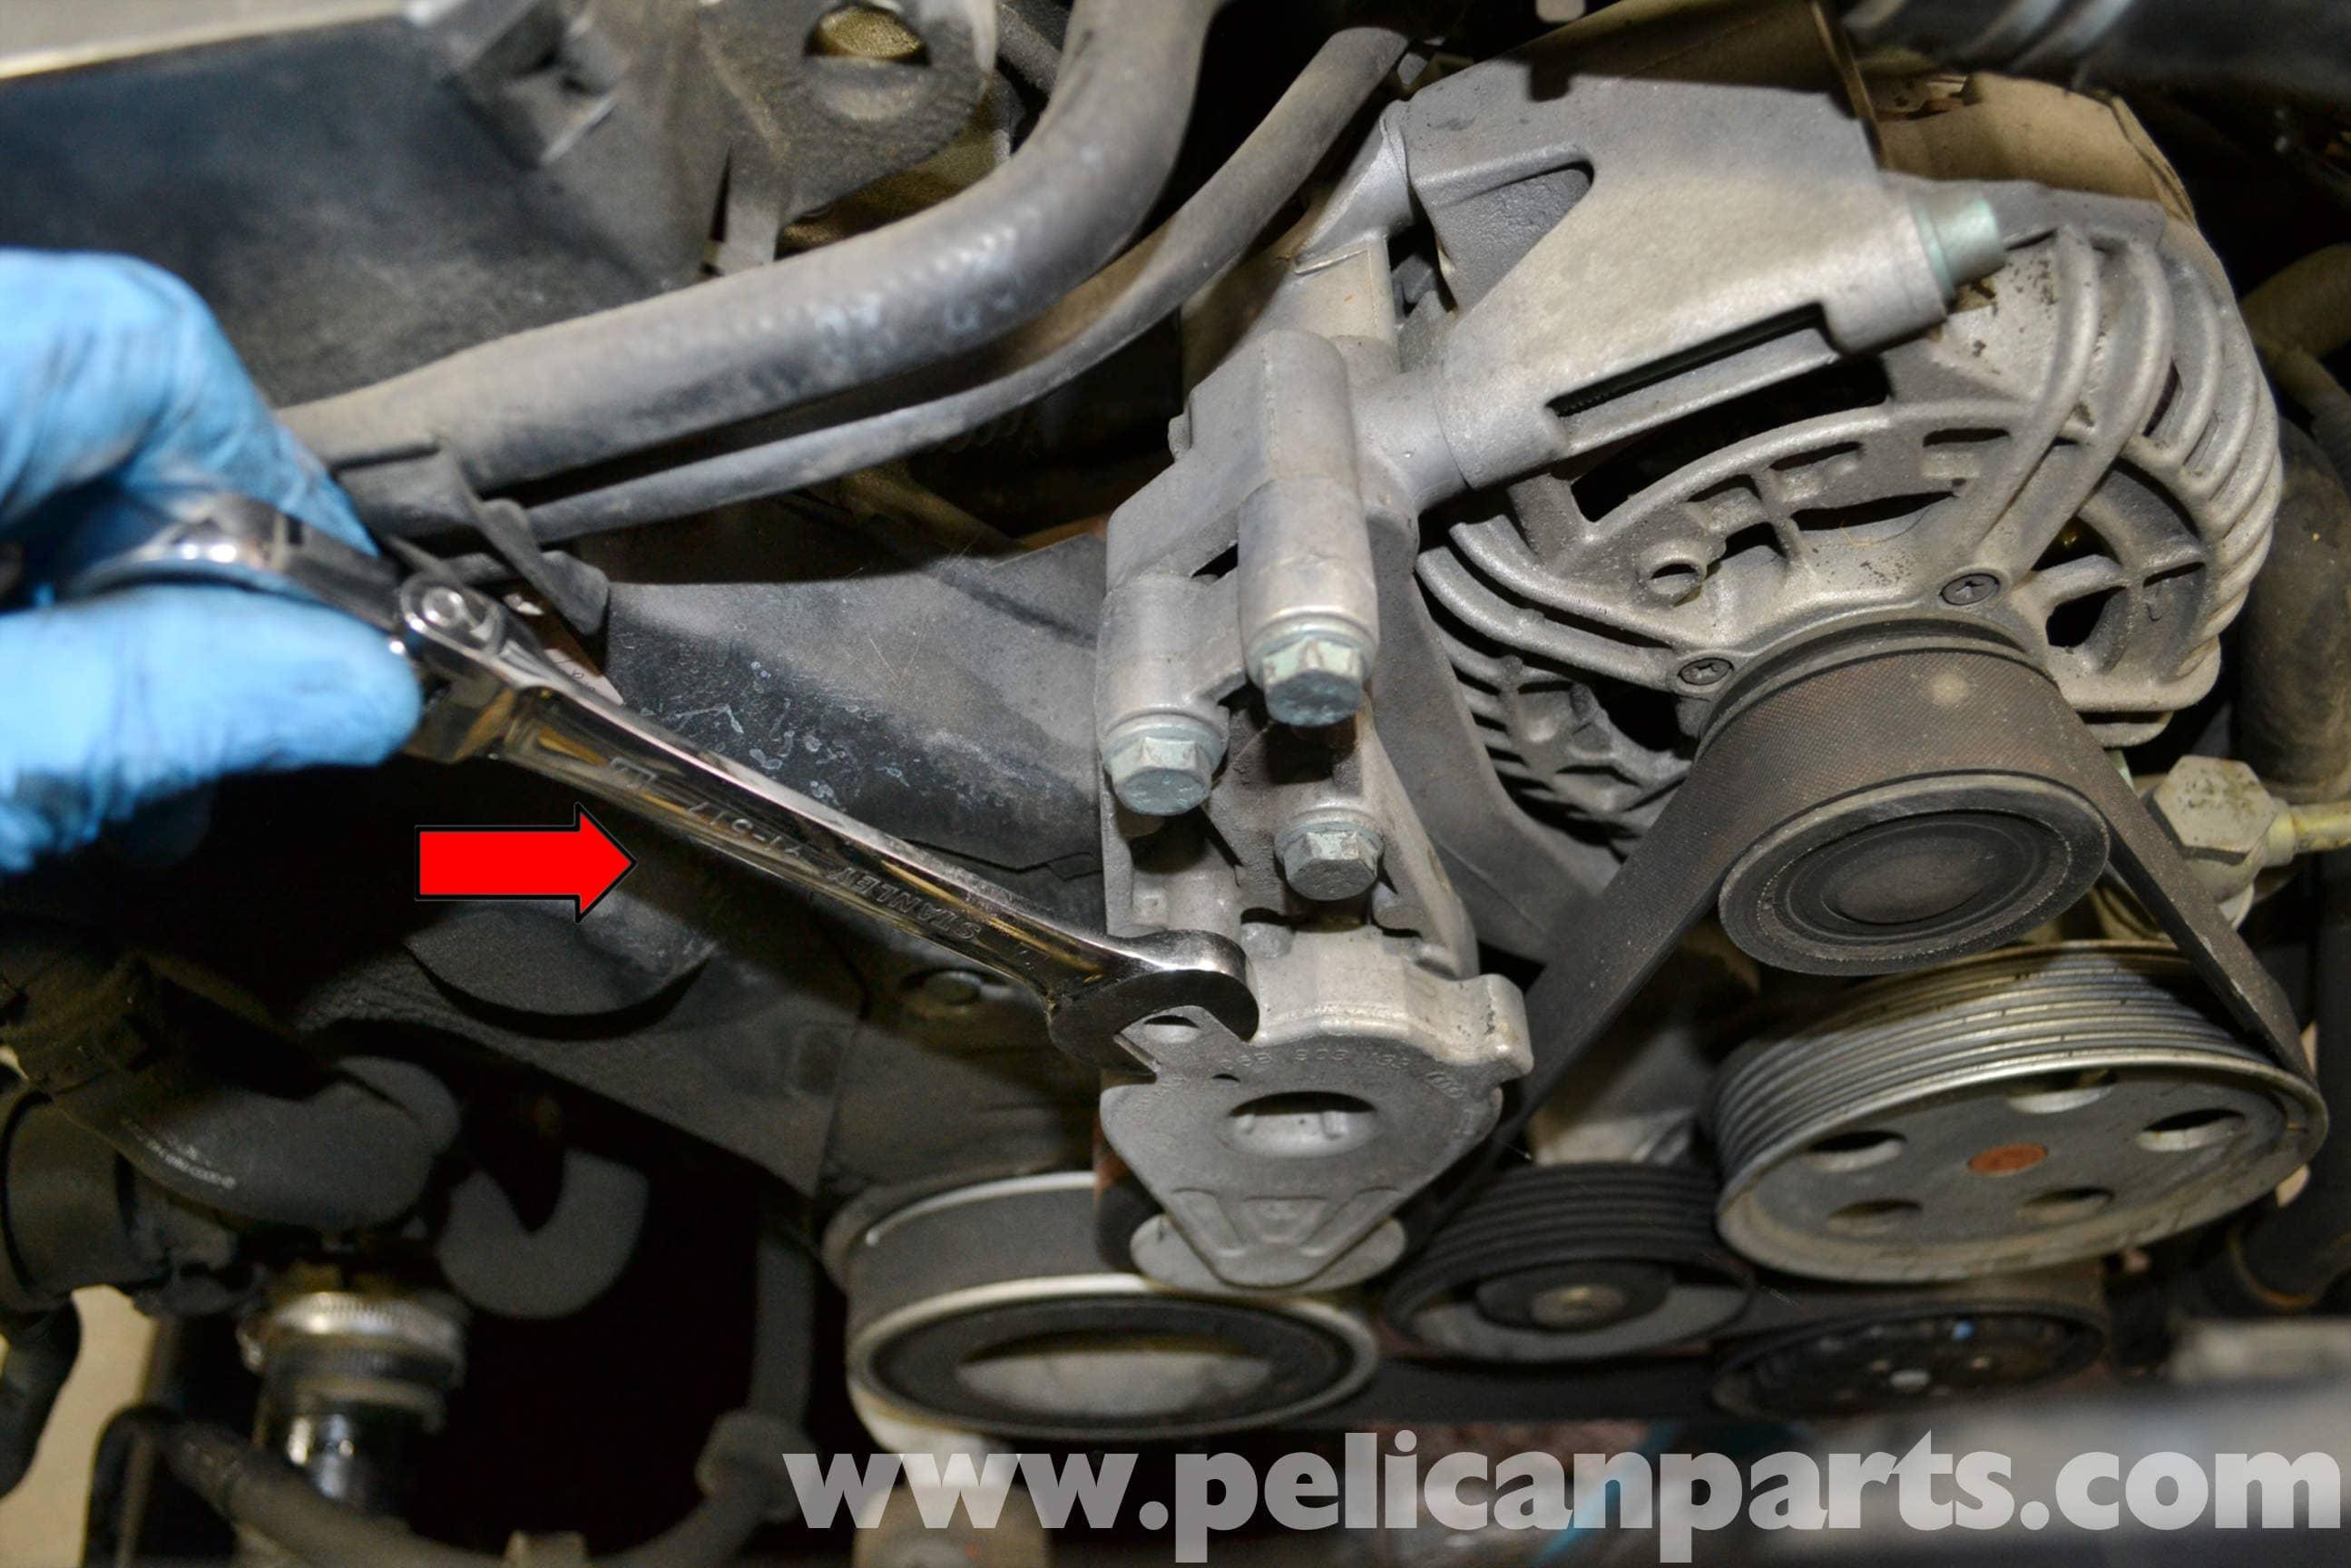 audi a4 b6 idler pulley replacement 2002 2008 pelican parts diy rh pelicanparts com 2001 Audi A4 1.8T Audi A4 Repair Manual